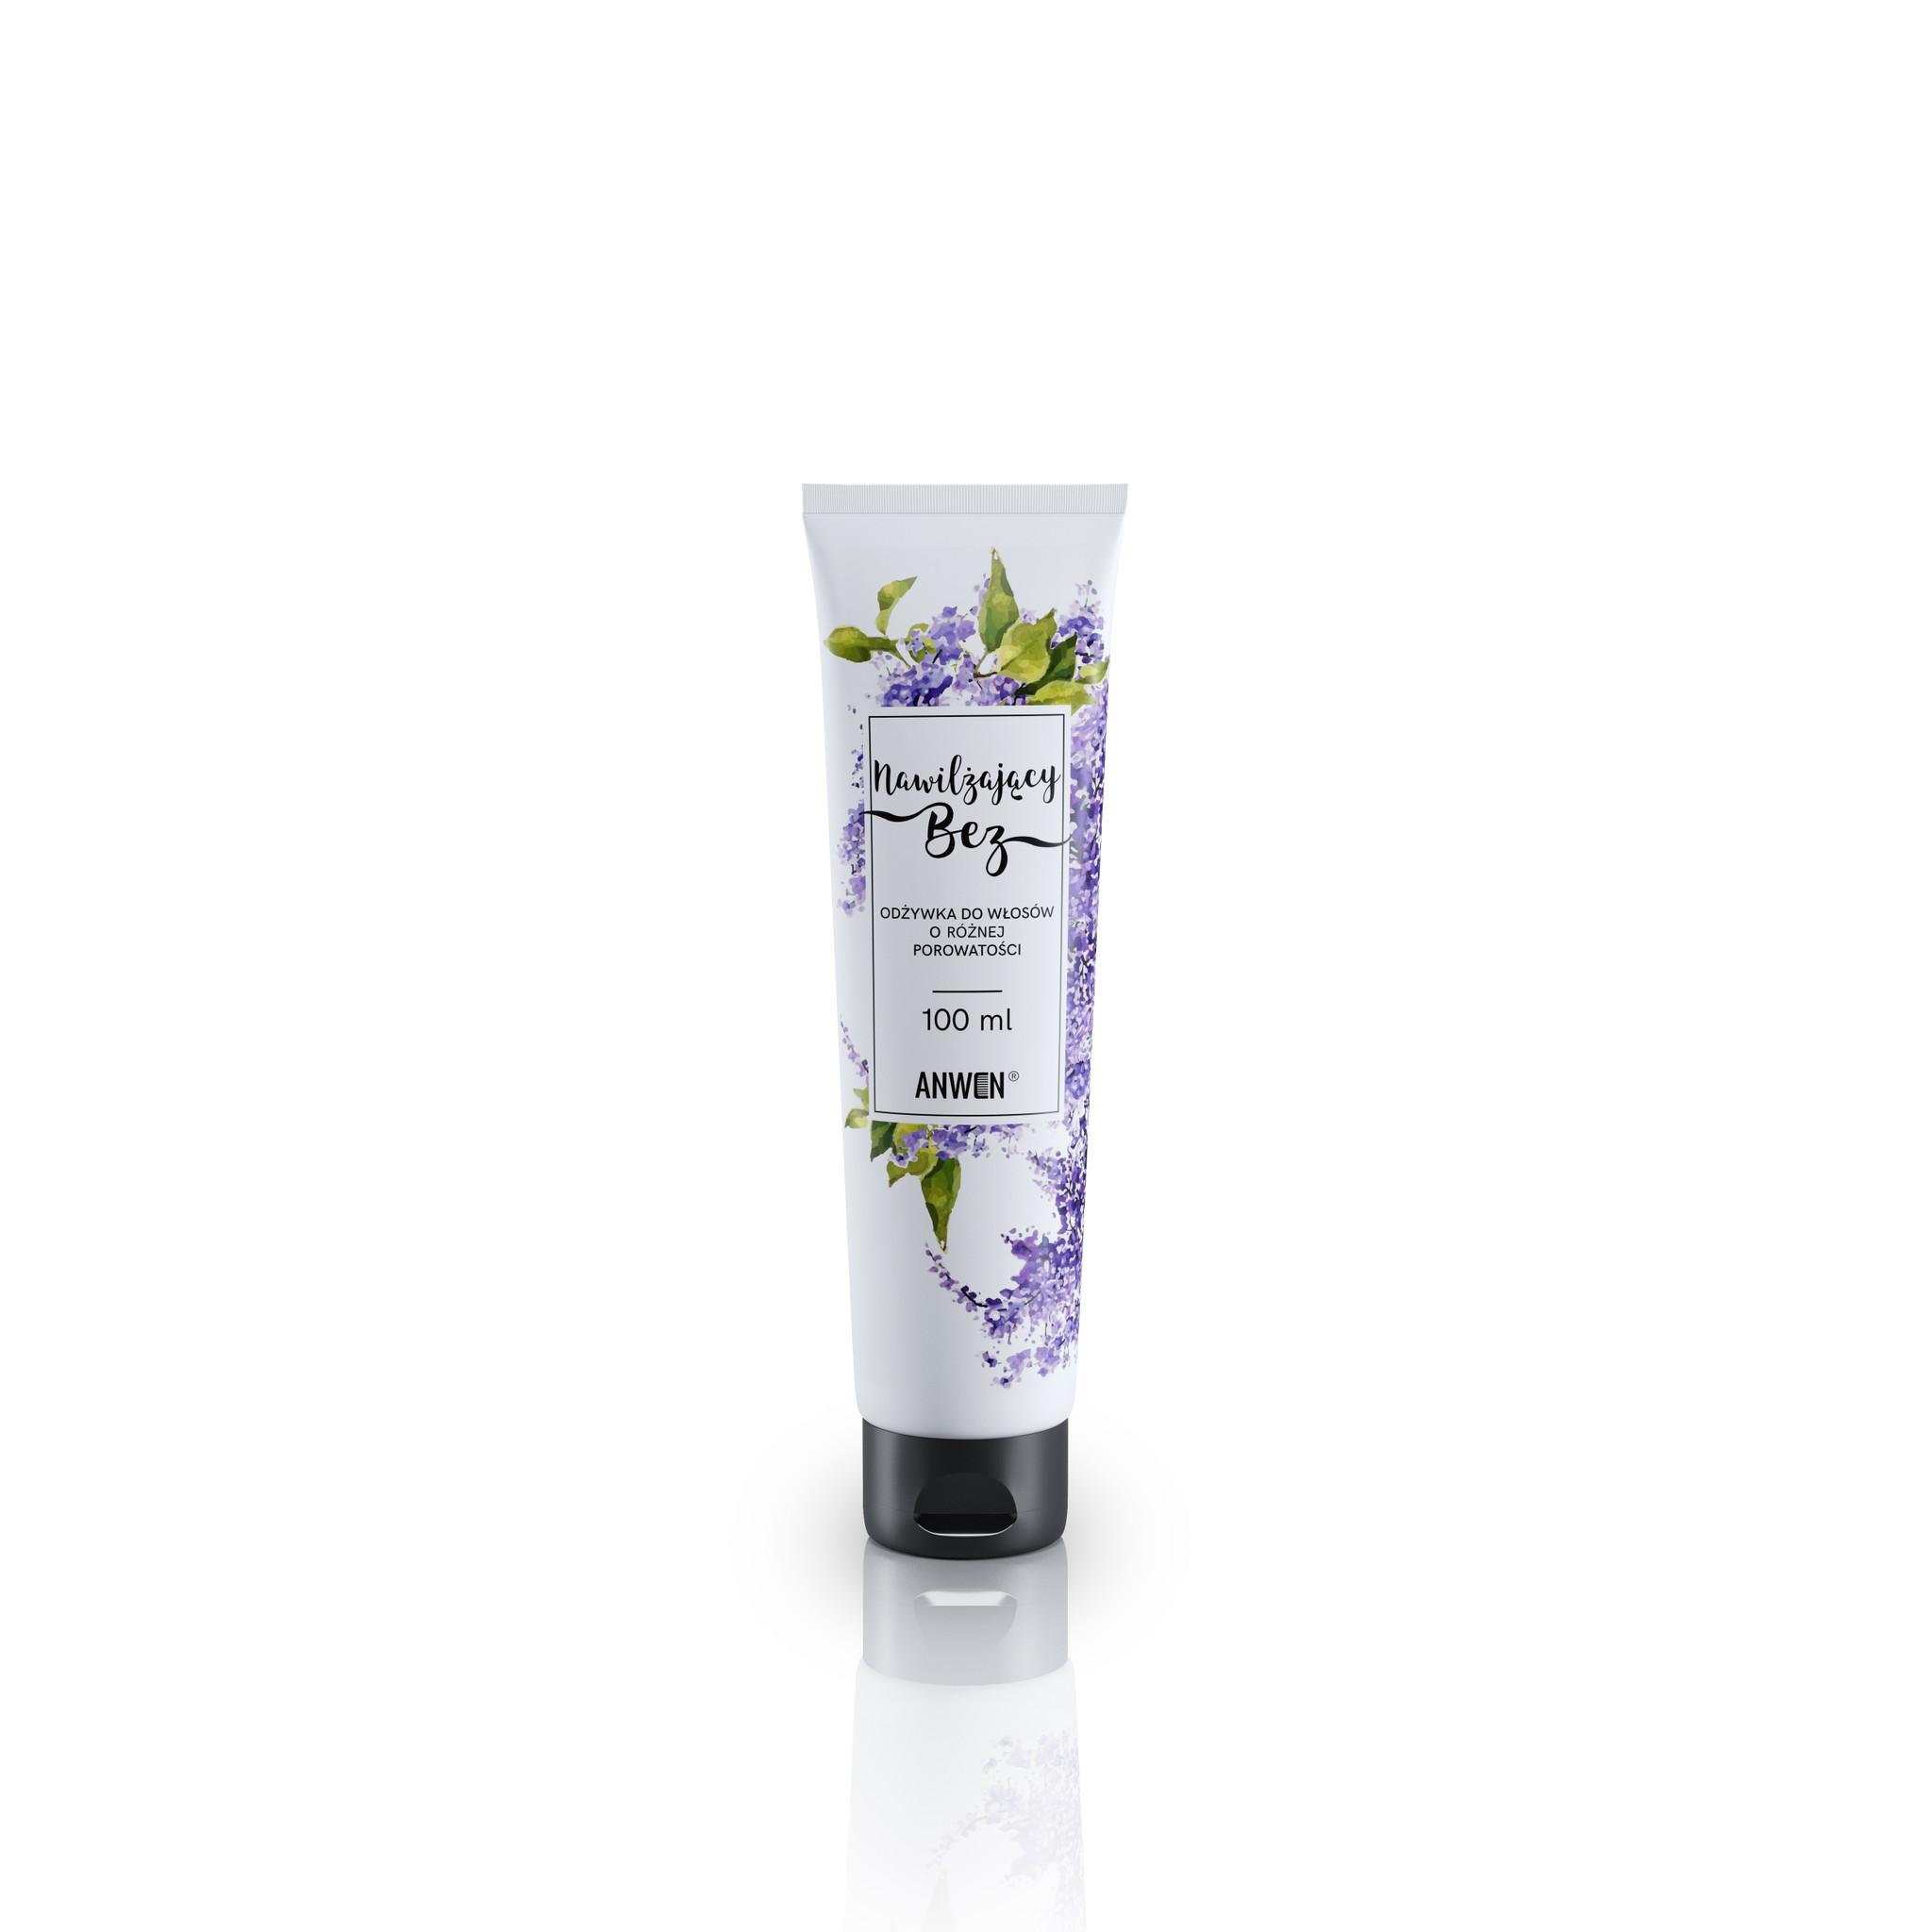 Anwen Moisturising Lilac